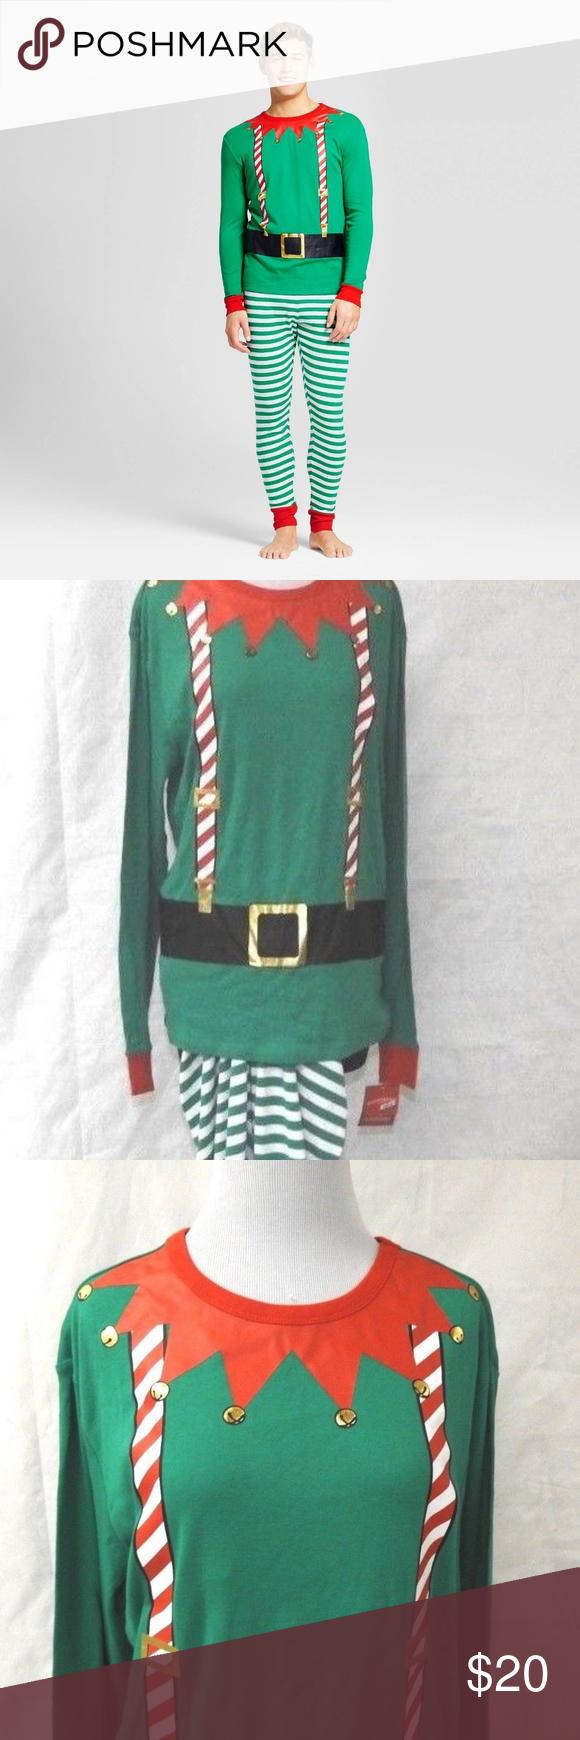 Men's Christmas Elf Pajama 2 Pc. Set Green/Red M Elf